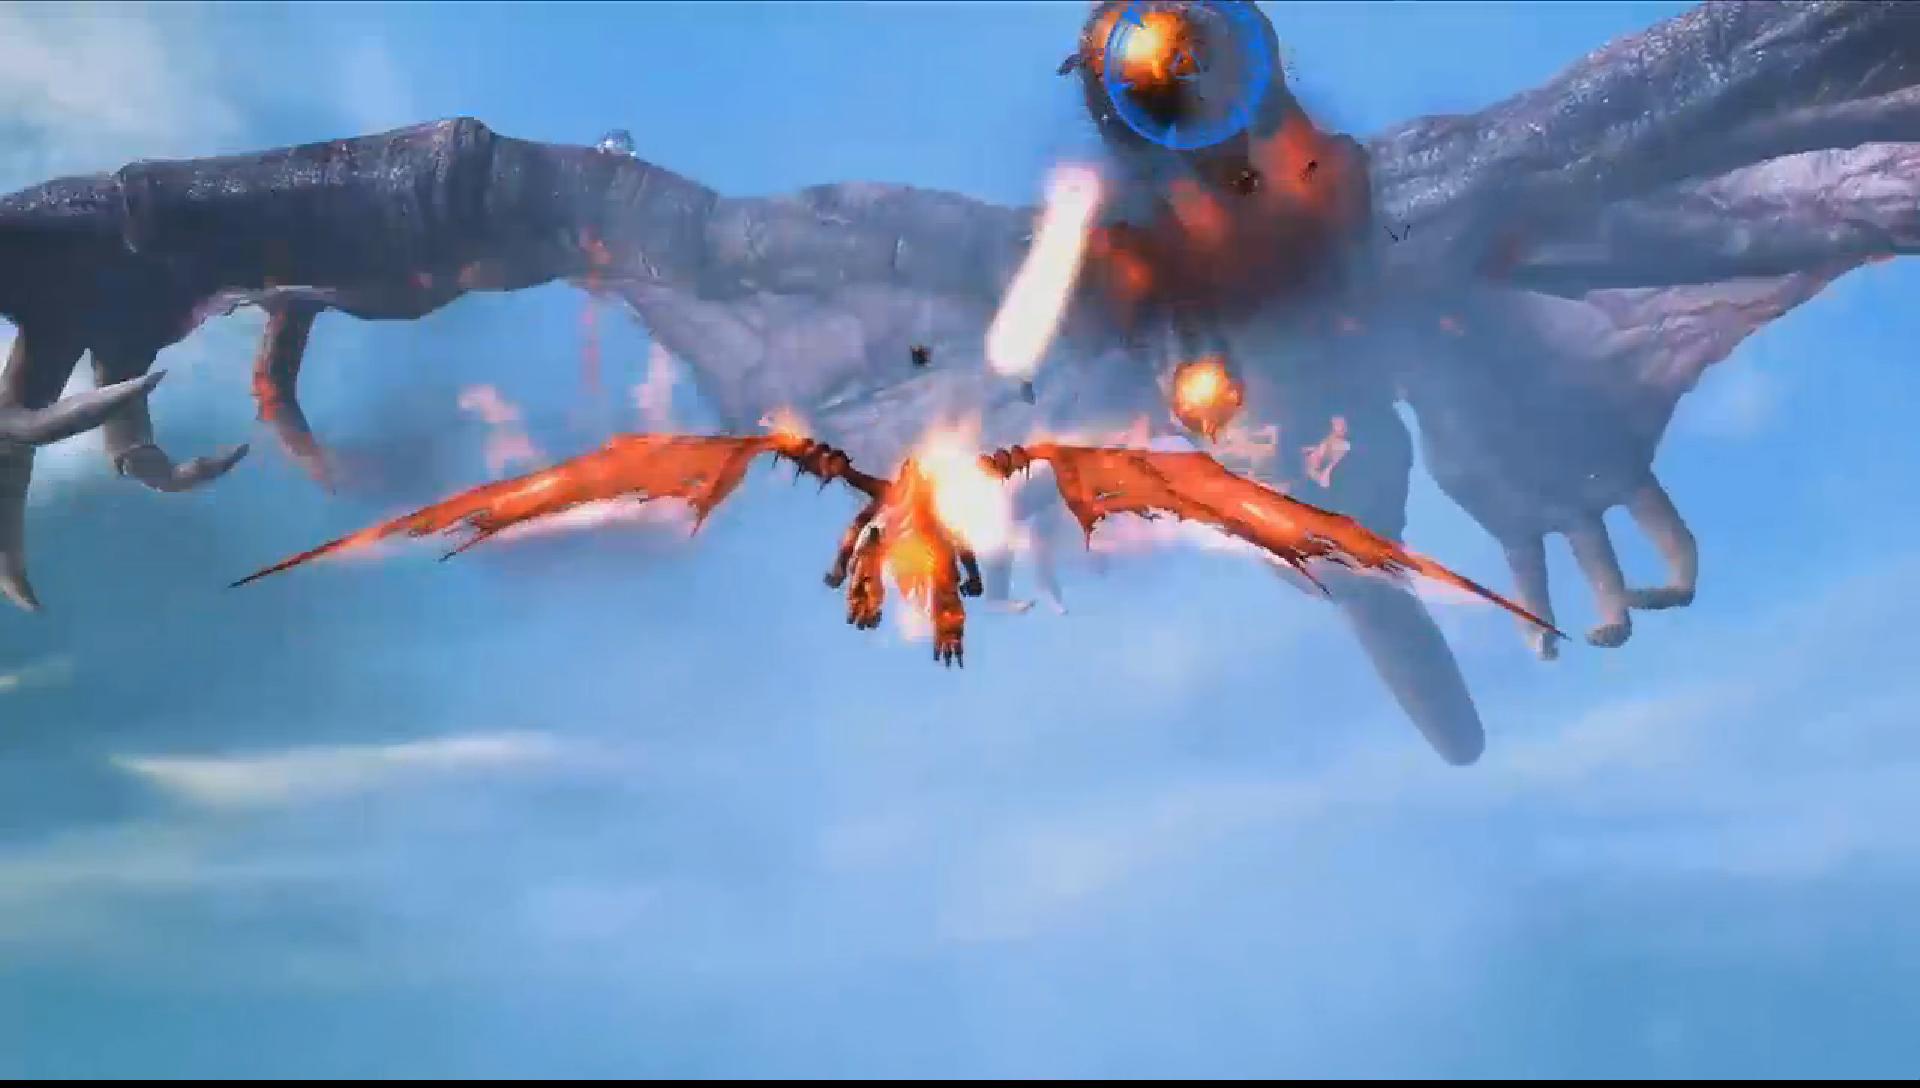 crimson dragon wallpaper - photo #19